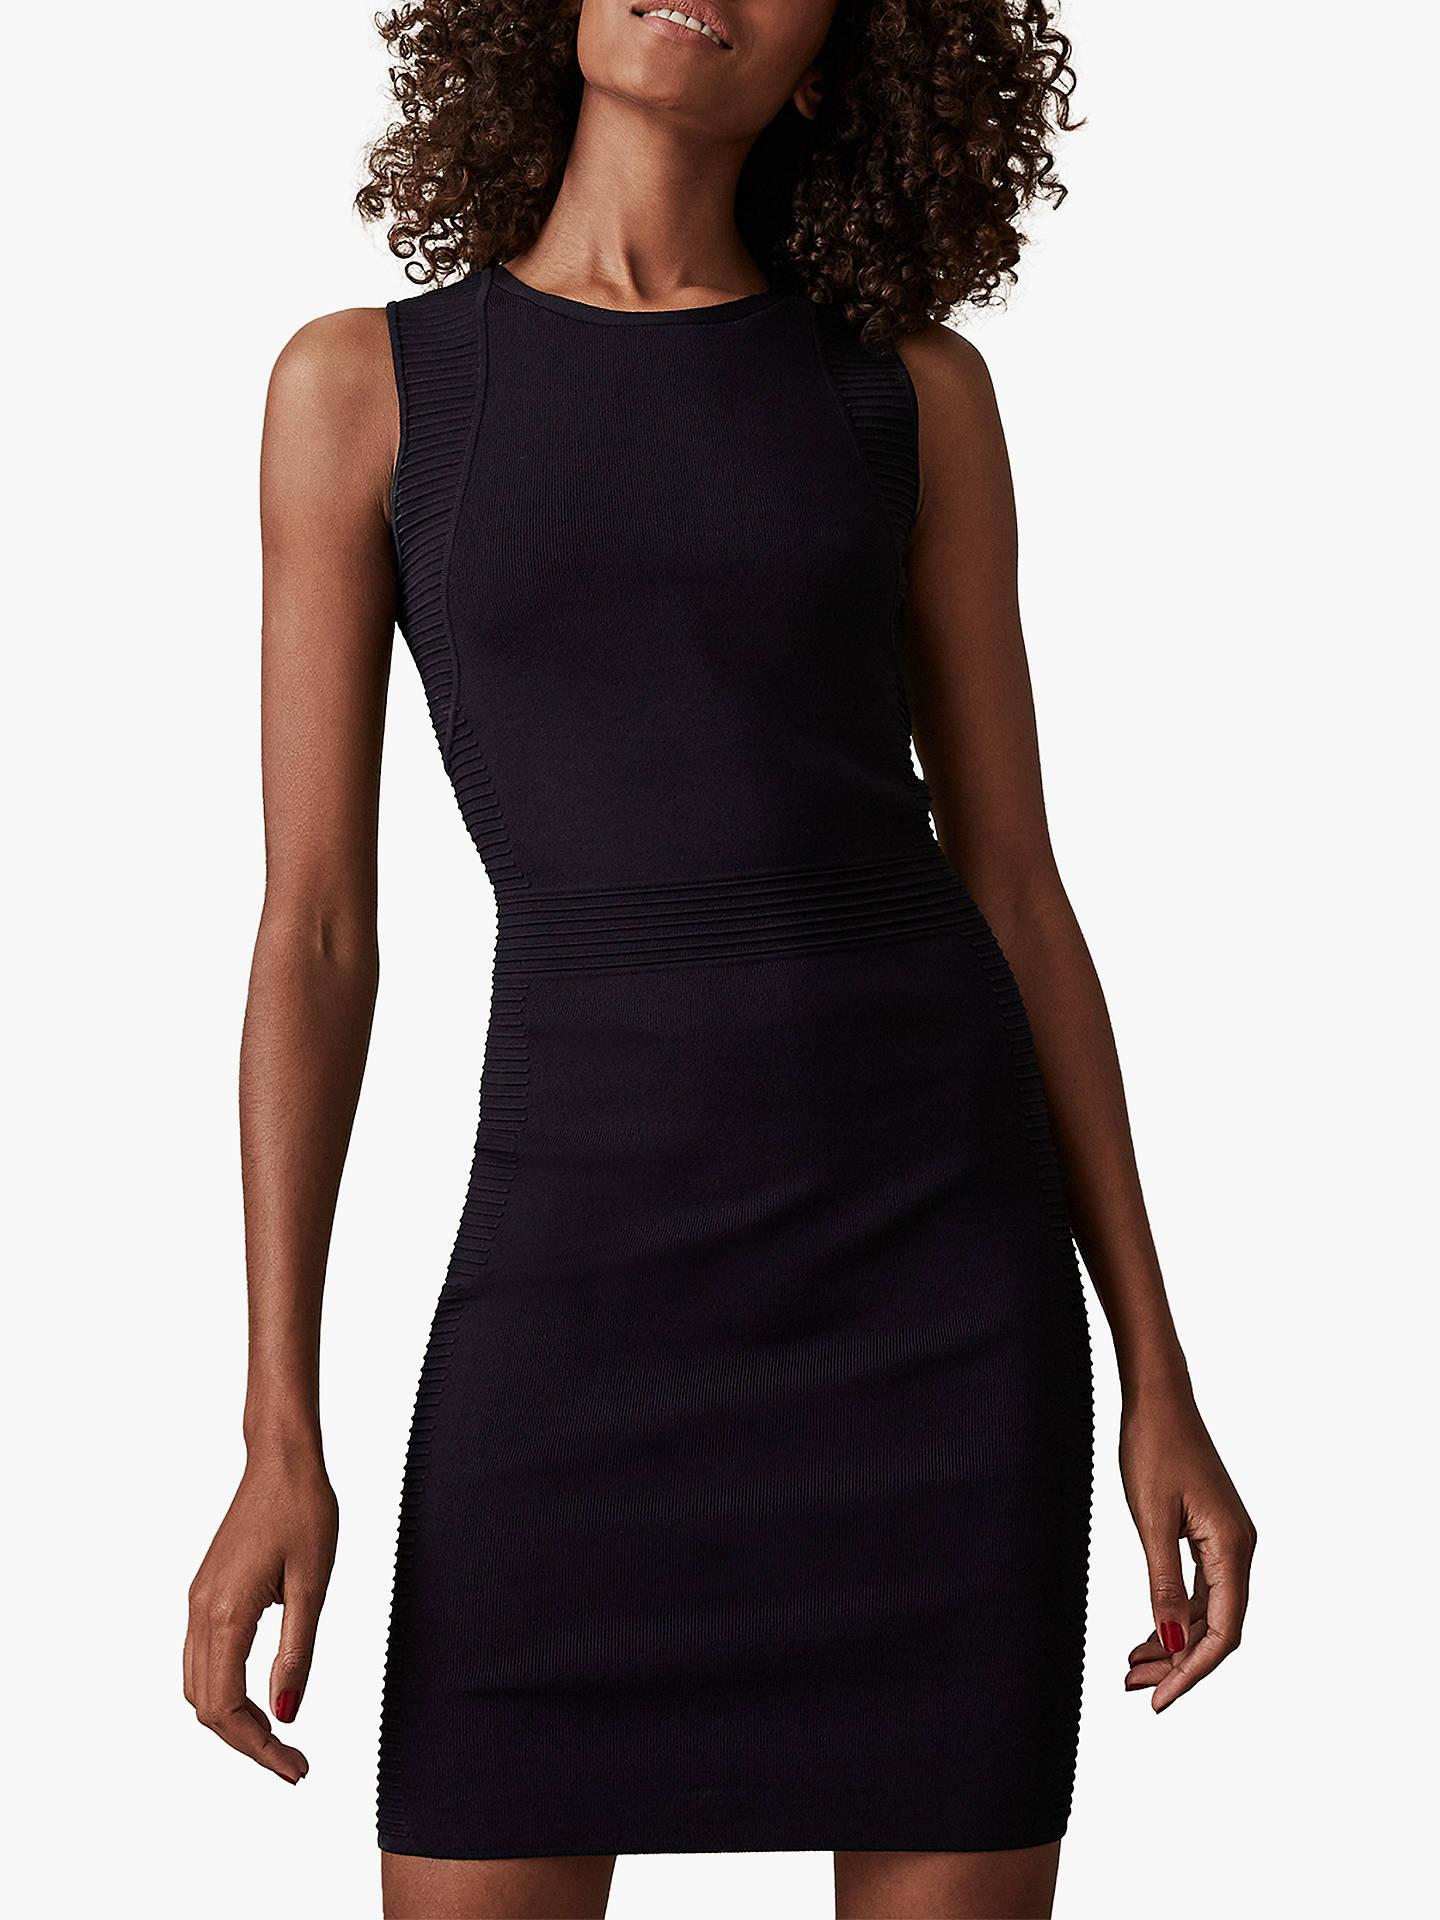 BuyReiss Diana Rib Knit Bodycon Dress ec89a7fb0